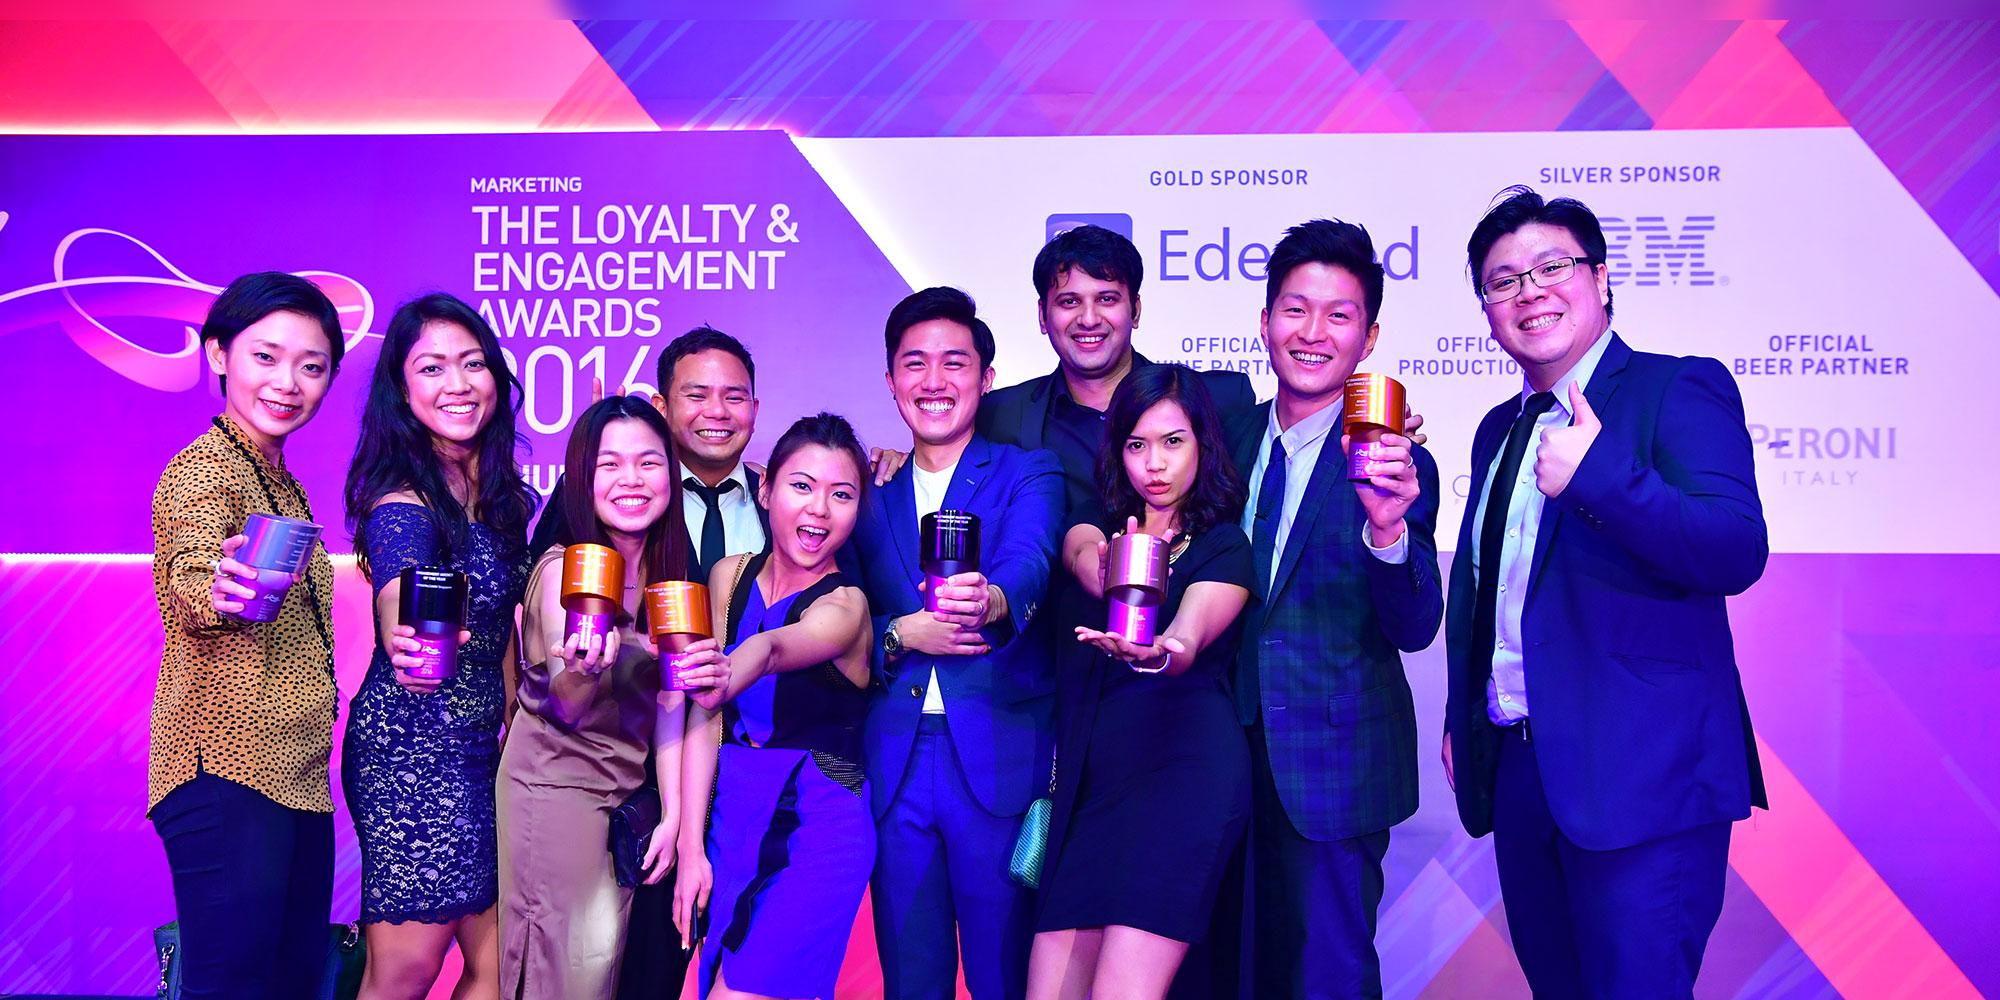 Loyalty & Engagement Awards 2017